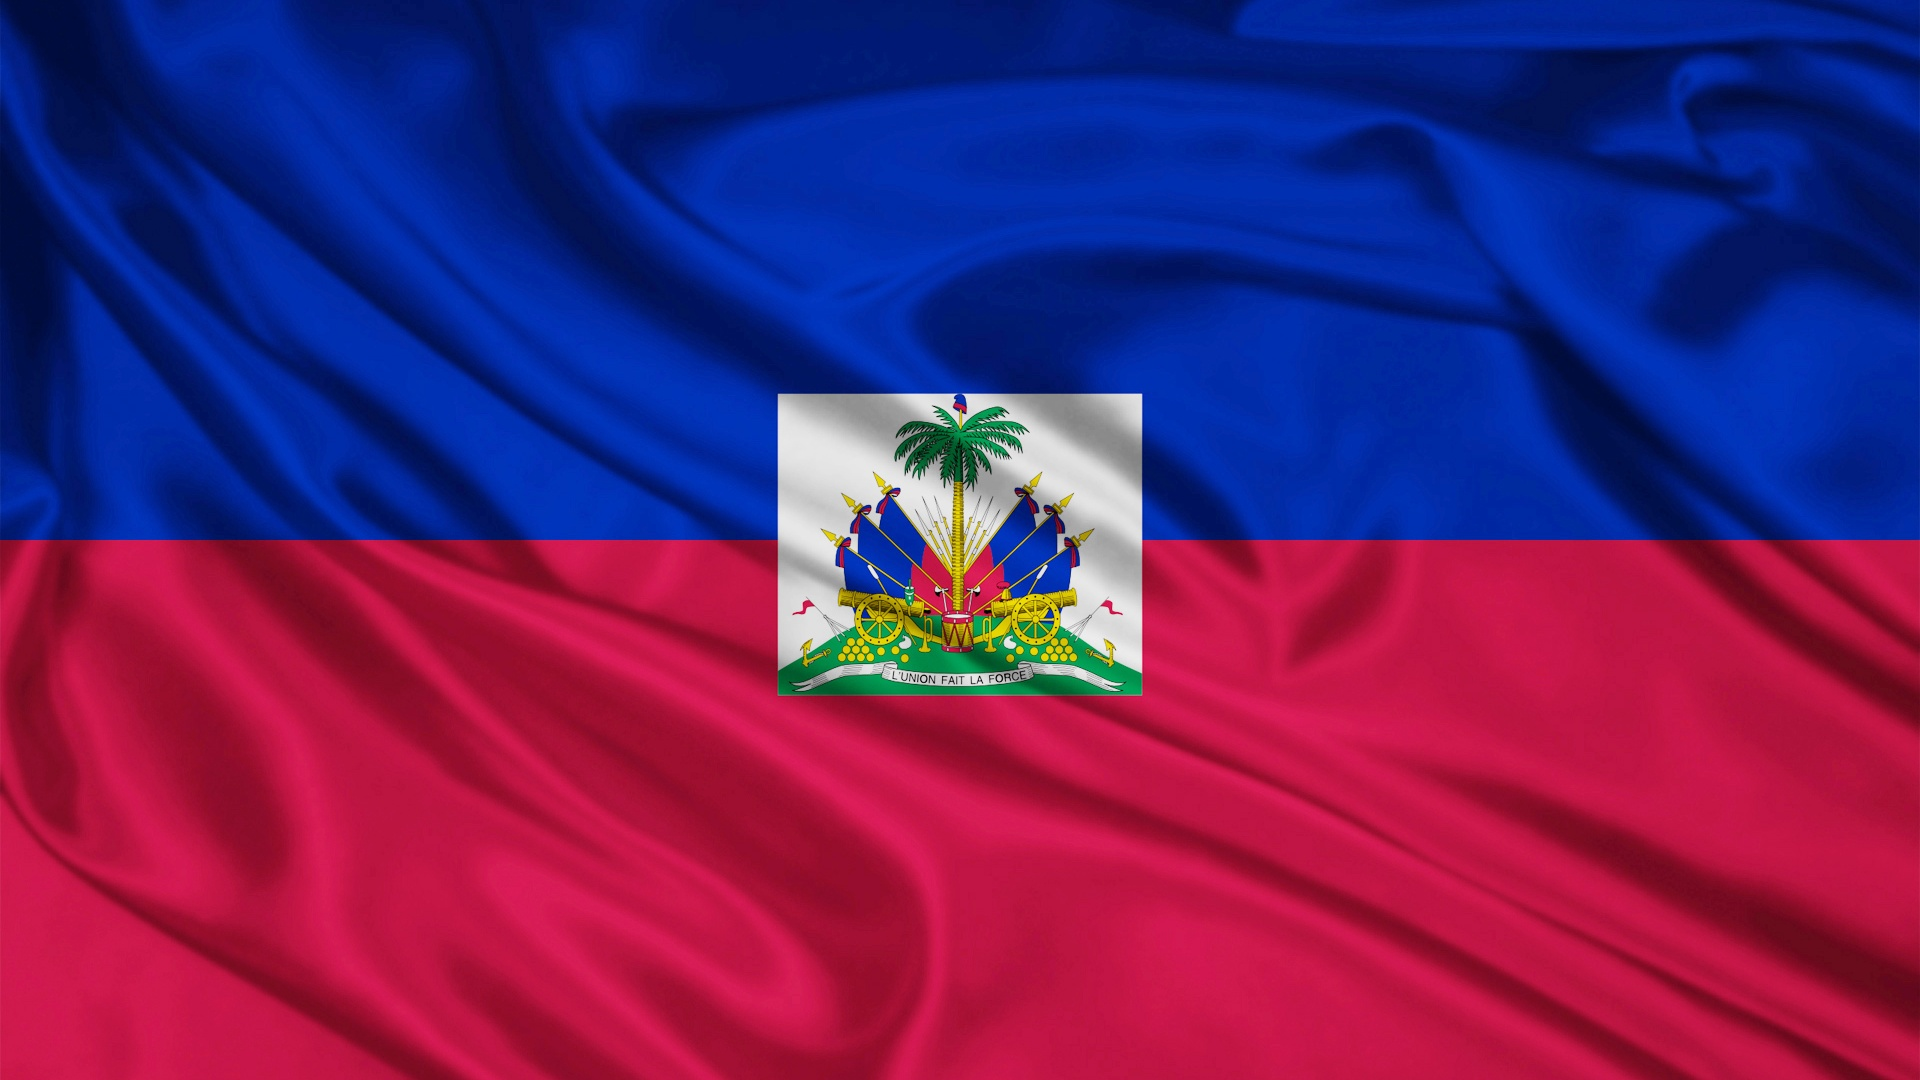 Haiti-Flag-Wallpaper